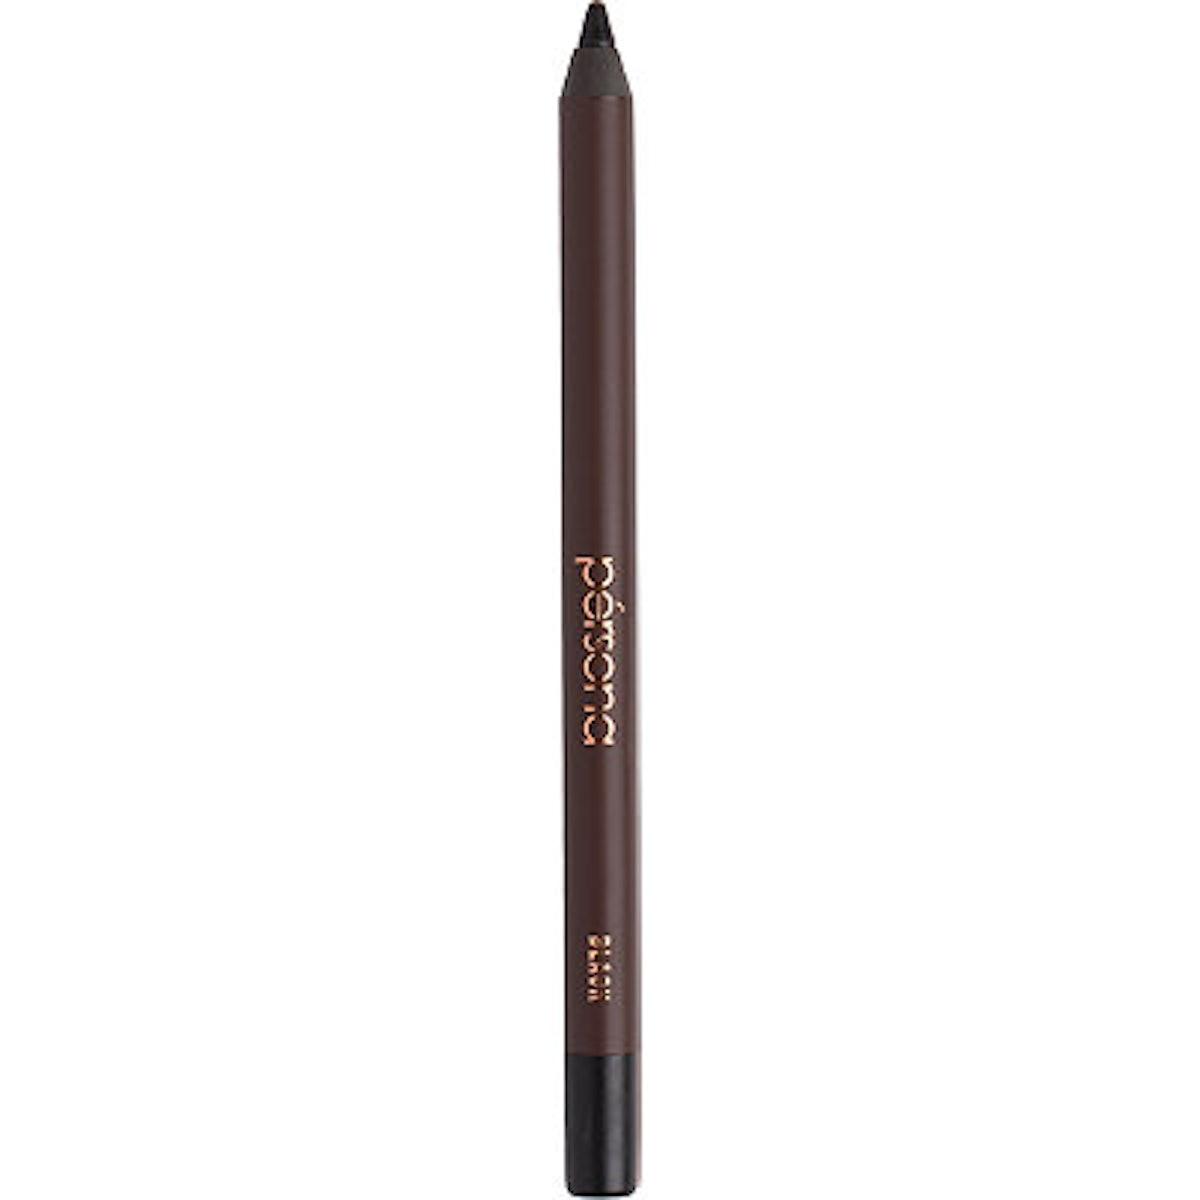 Pérsona Cosmetics 24 HR Waterproof Eyeliner